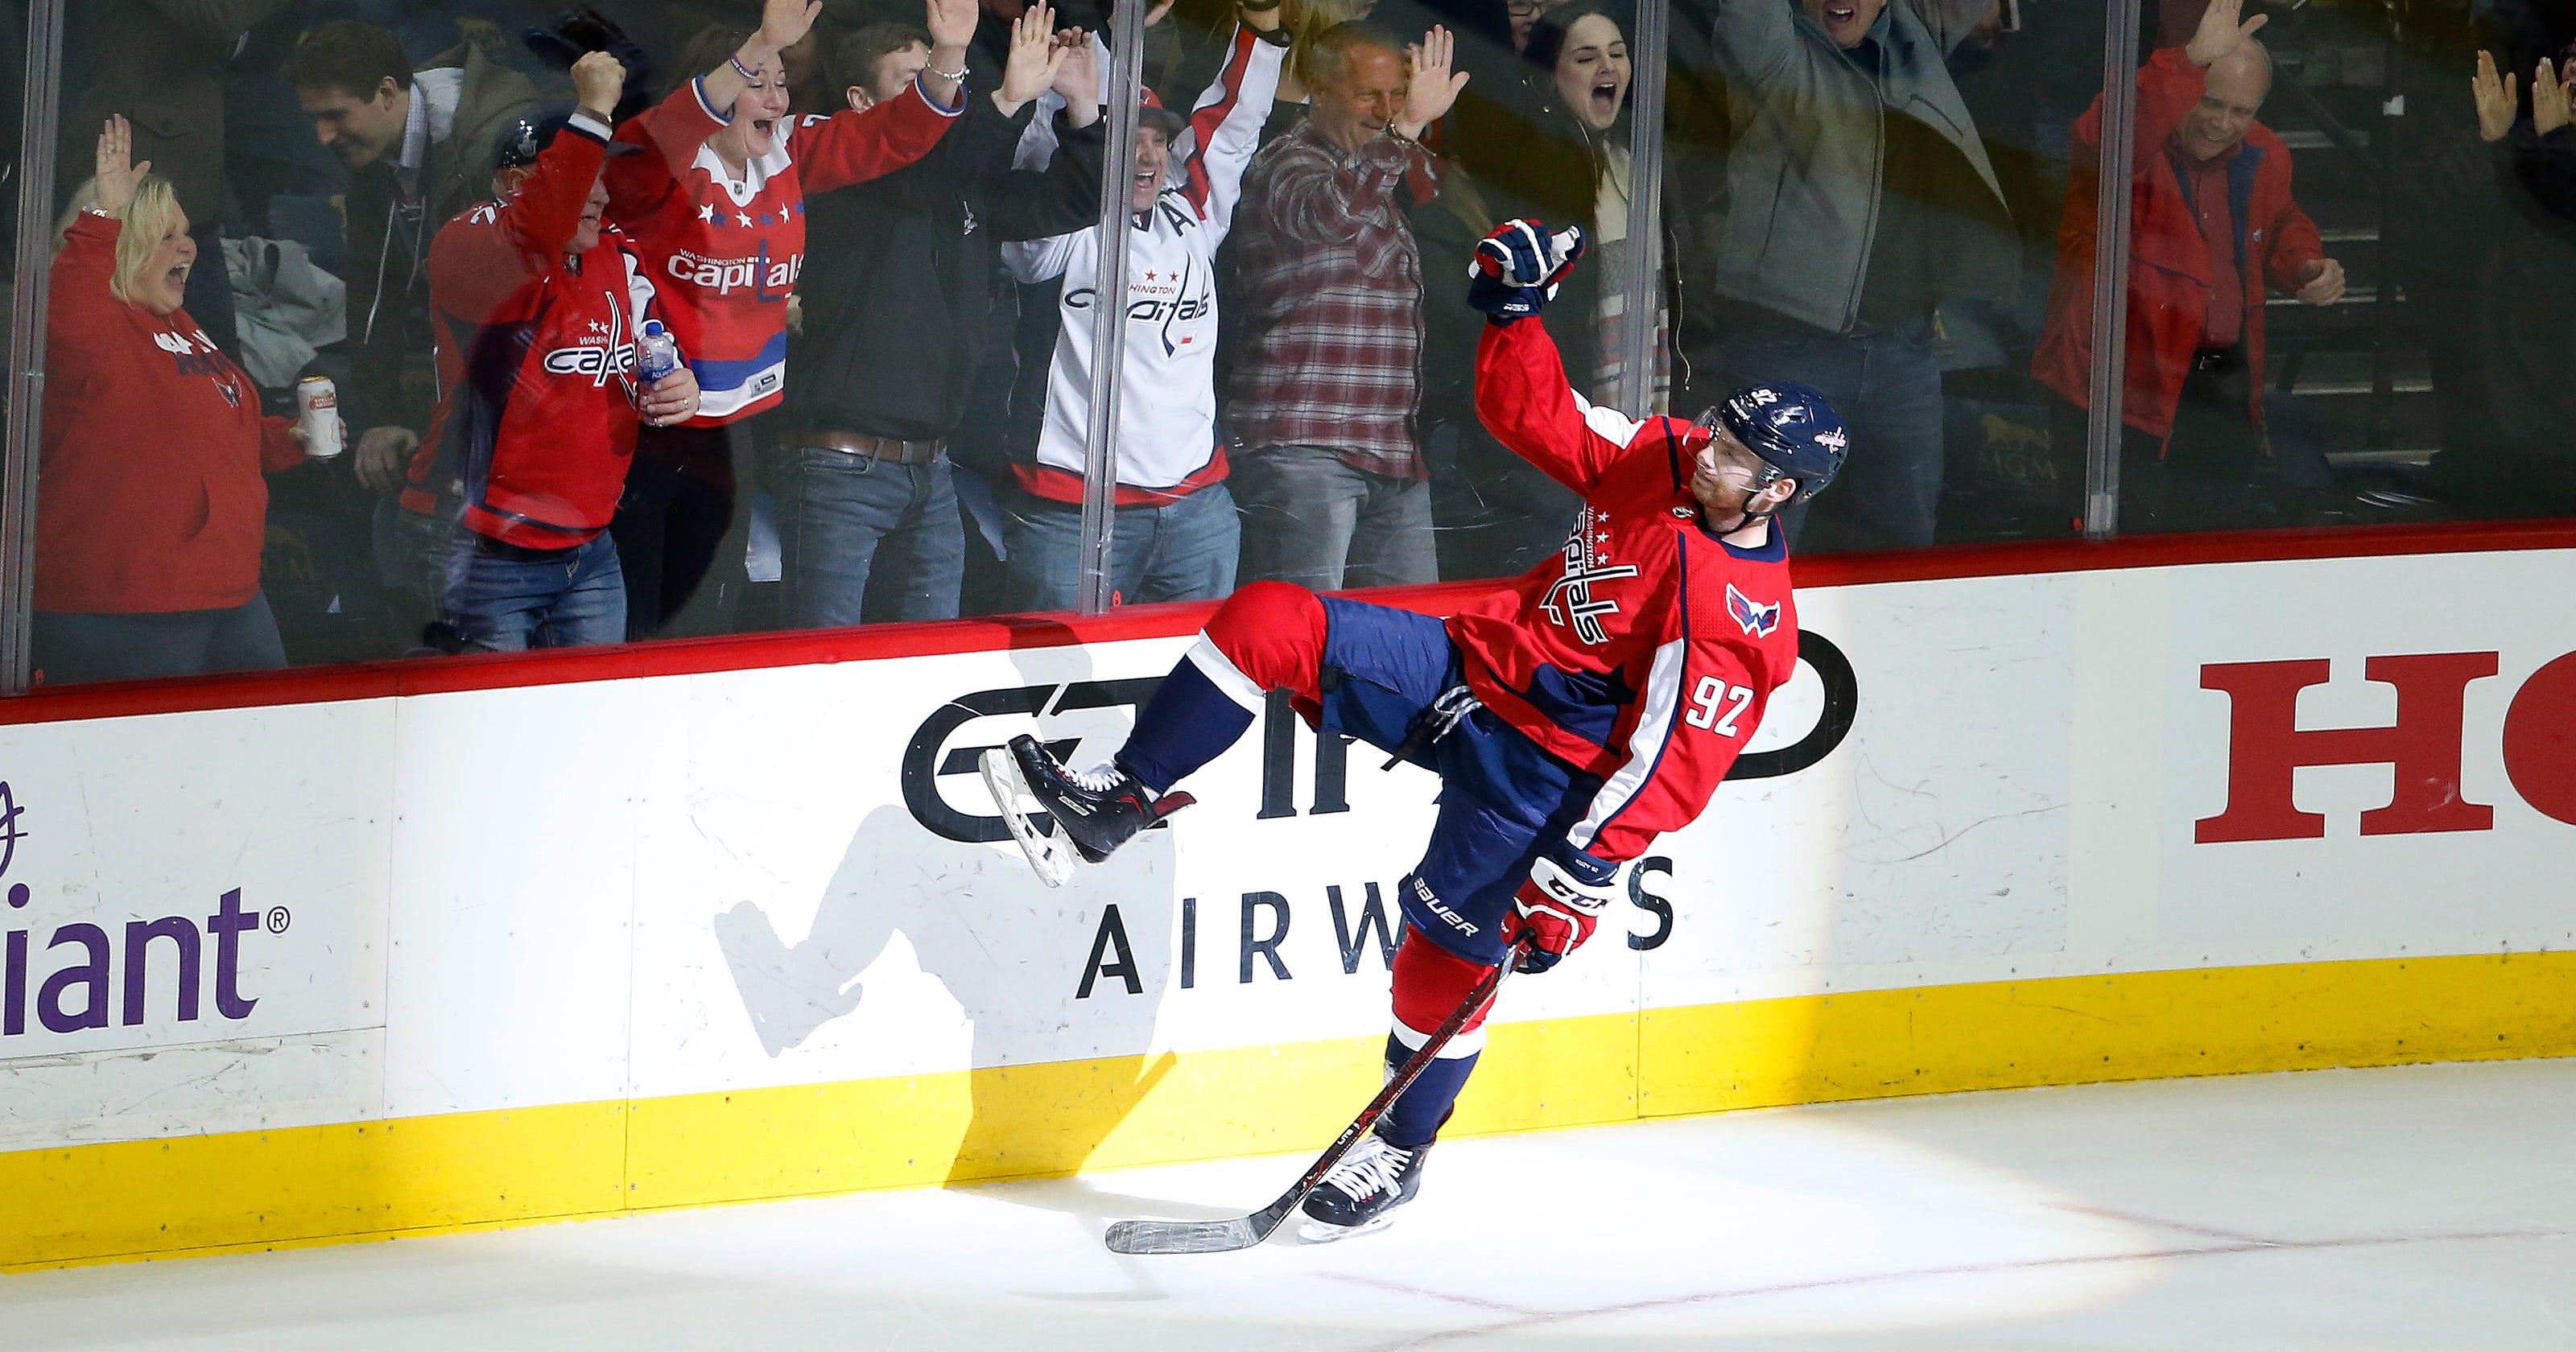 eec901fa44a Evgeny Kuznetsov scores in OT to lift Capitals over Rangers